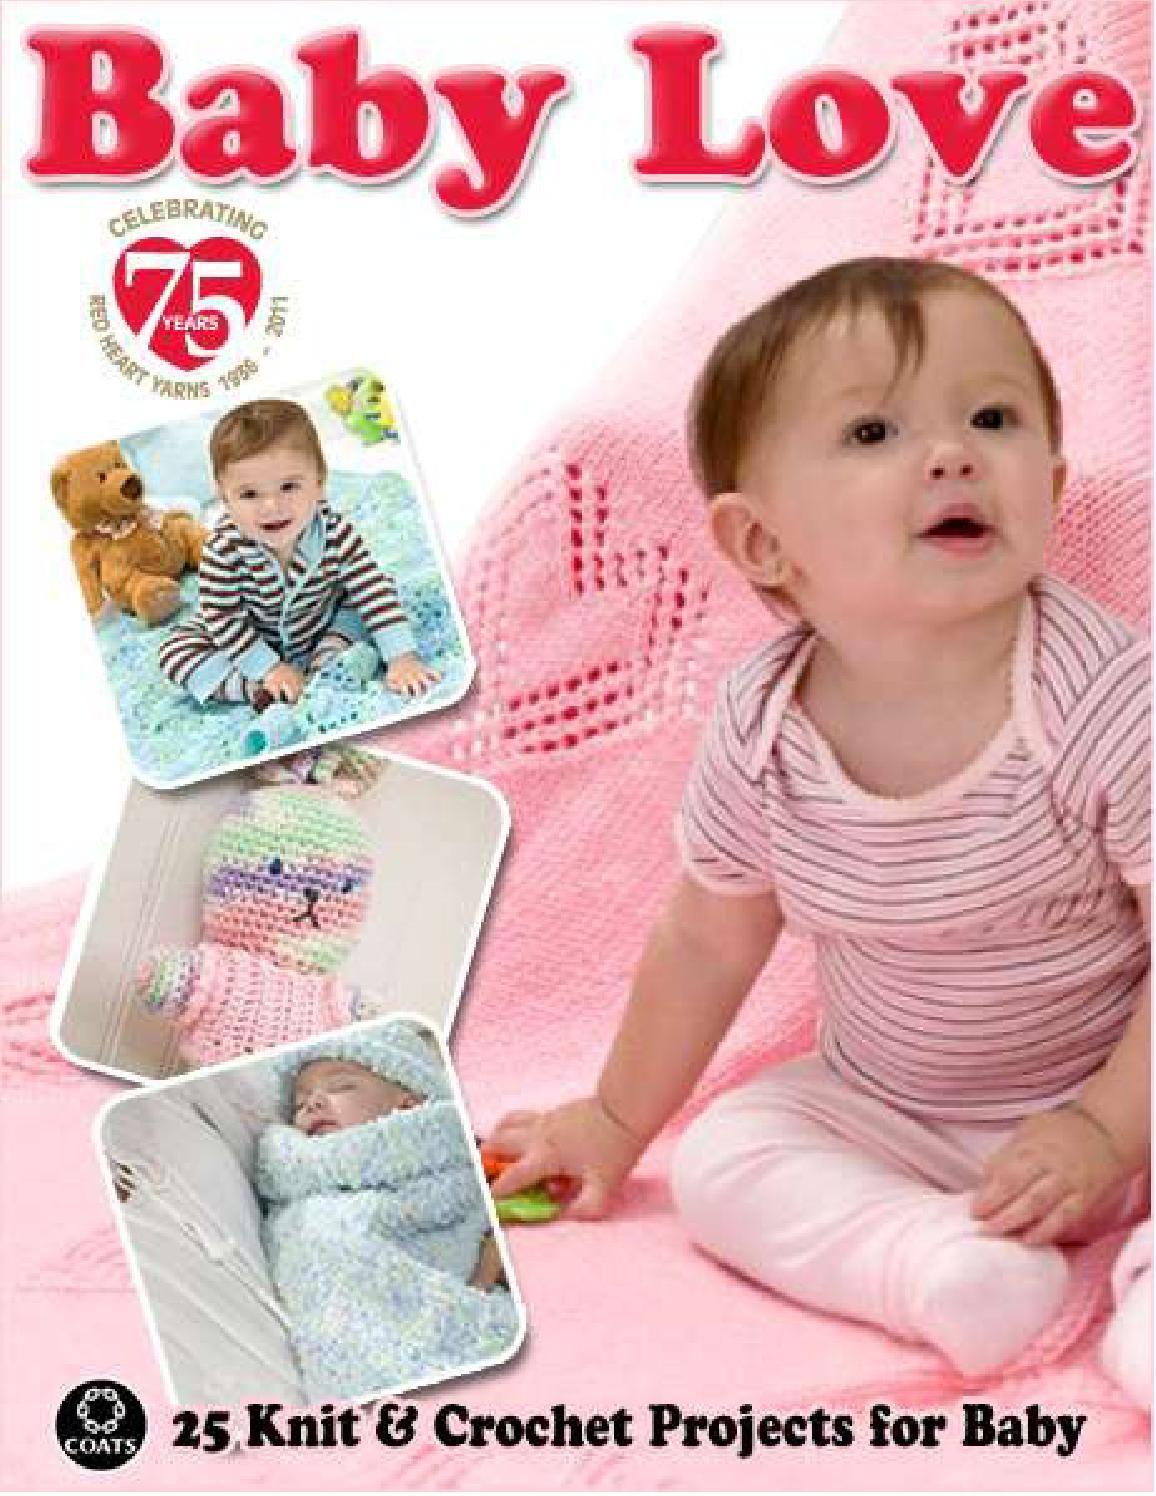 39041fb25 Baby love